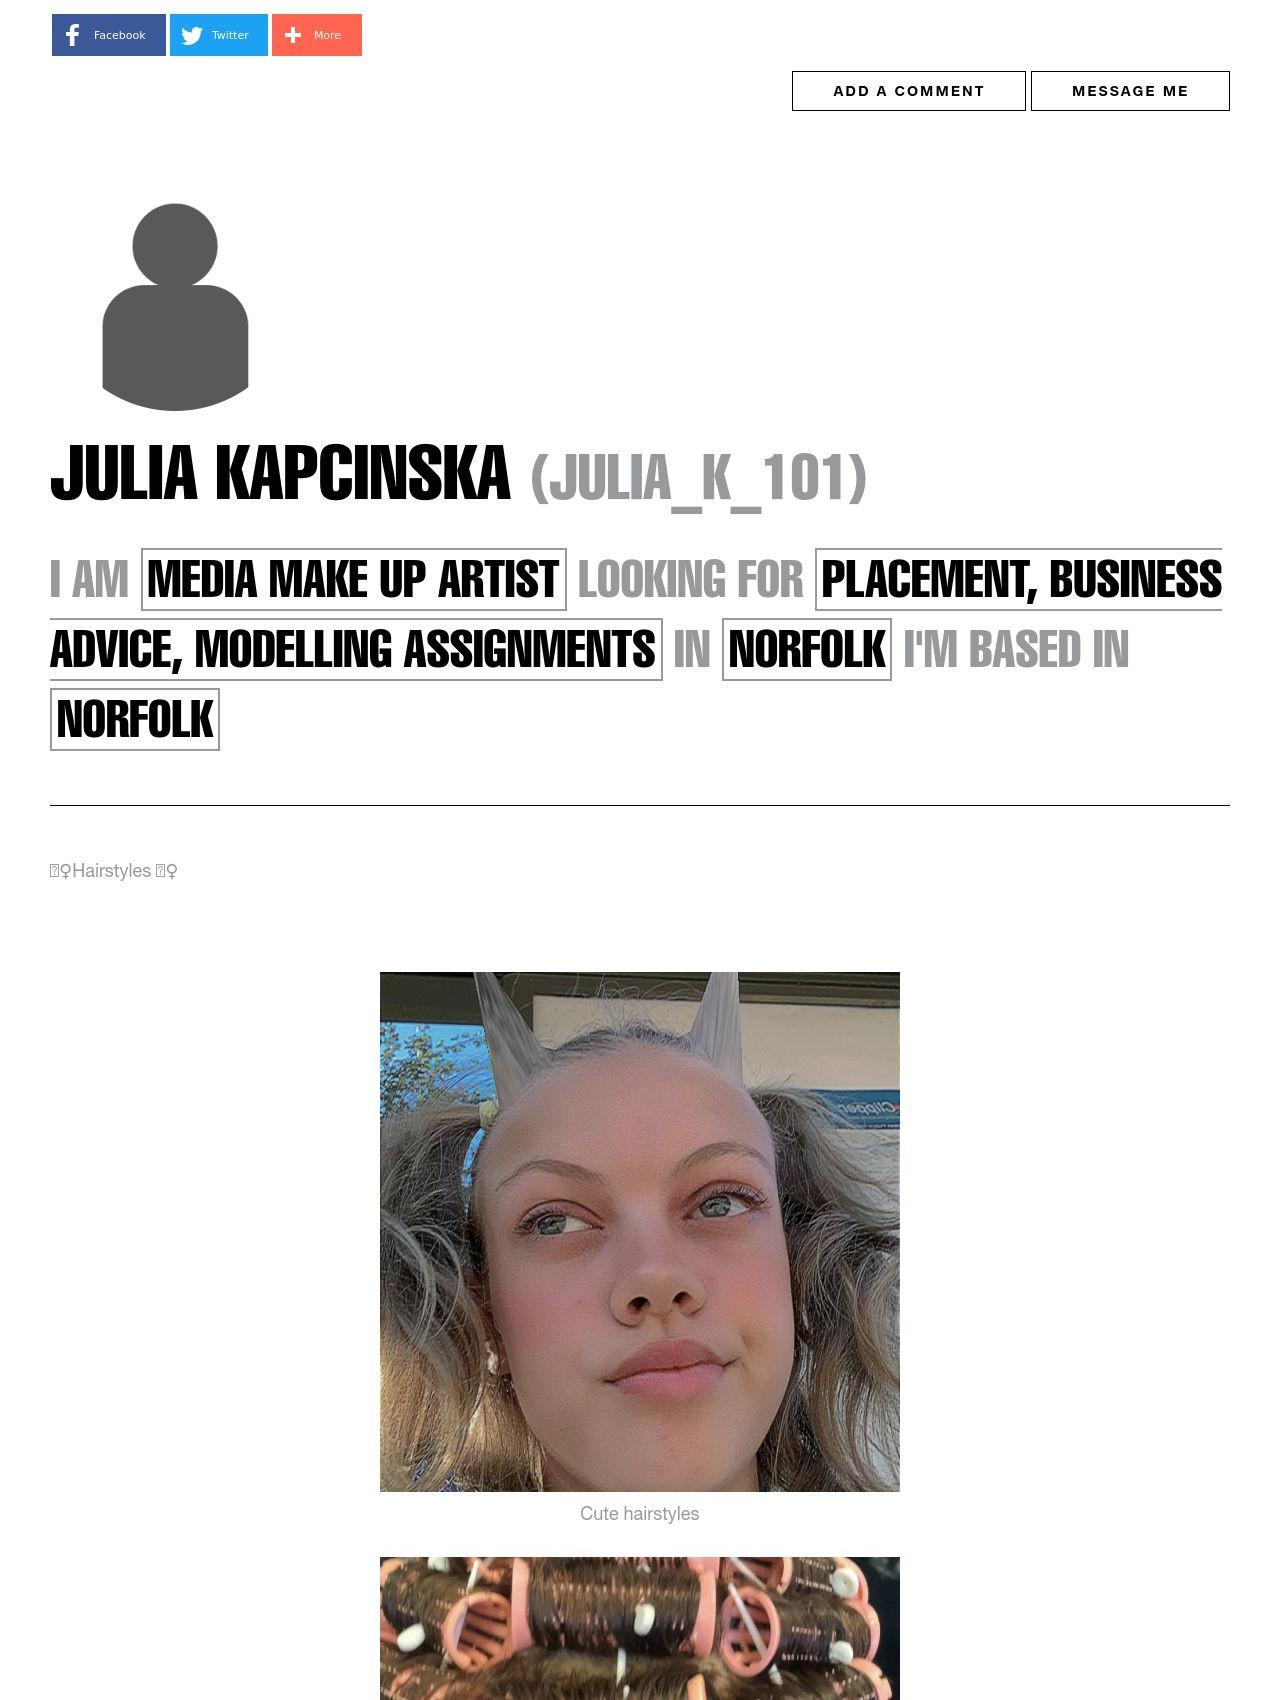 Julia Kapcinska